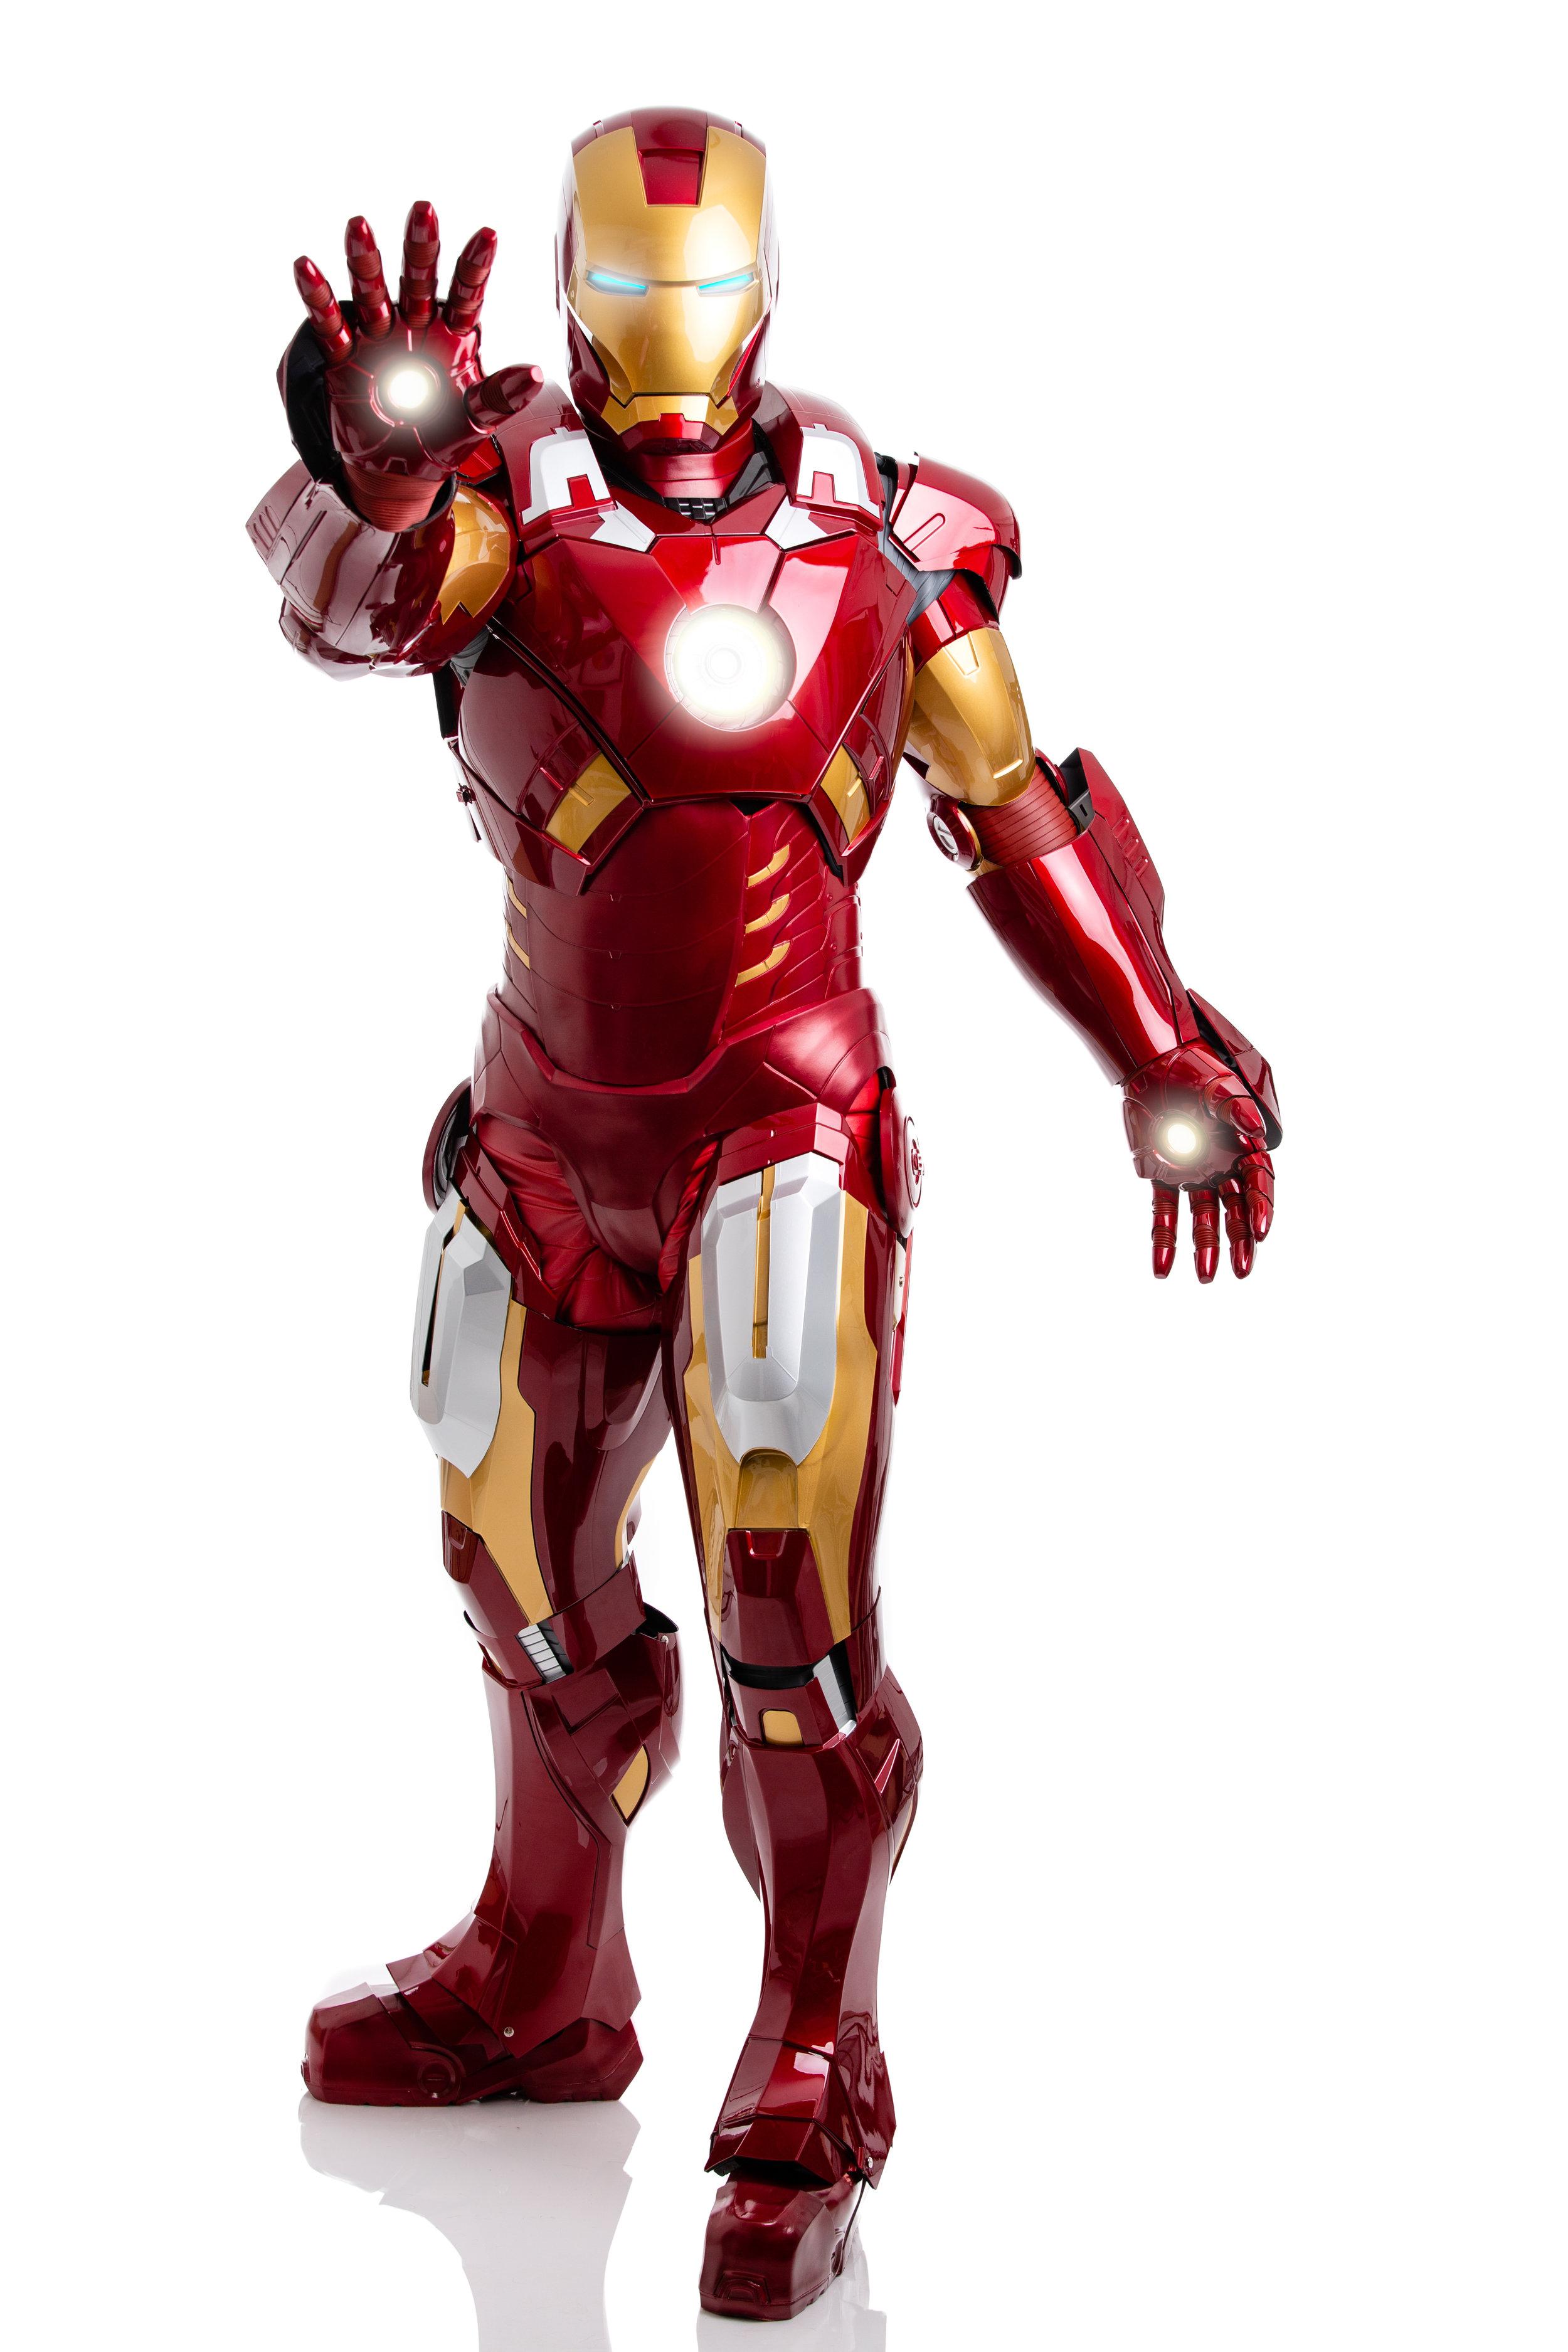 Iron Man (Paul MacDowell) at ELM Photo Studio